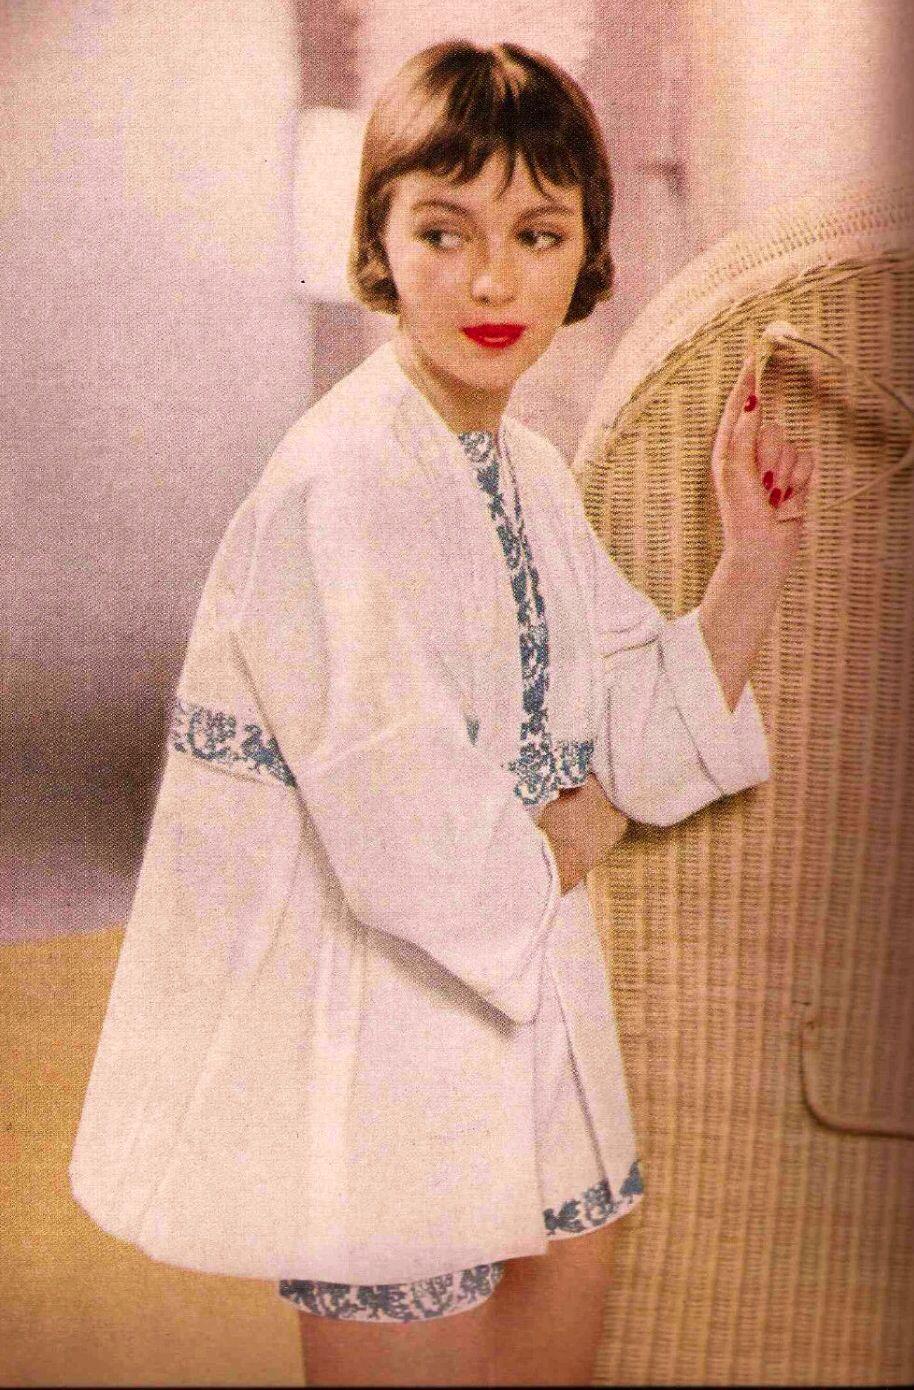 Harper's Bazaar, May, 1955, beach wear